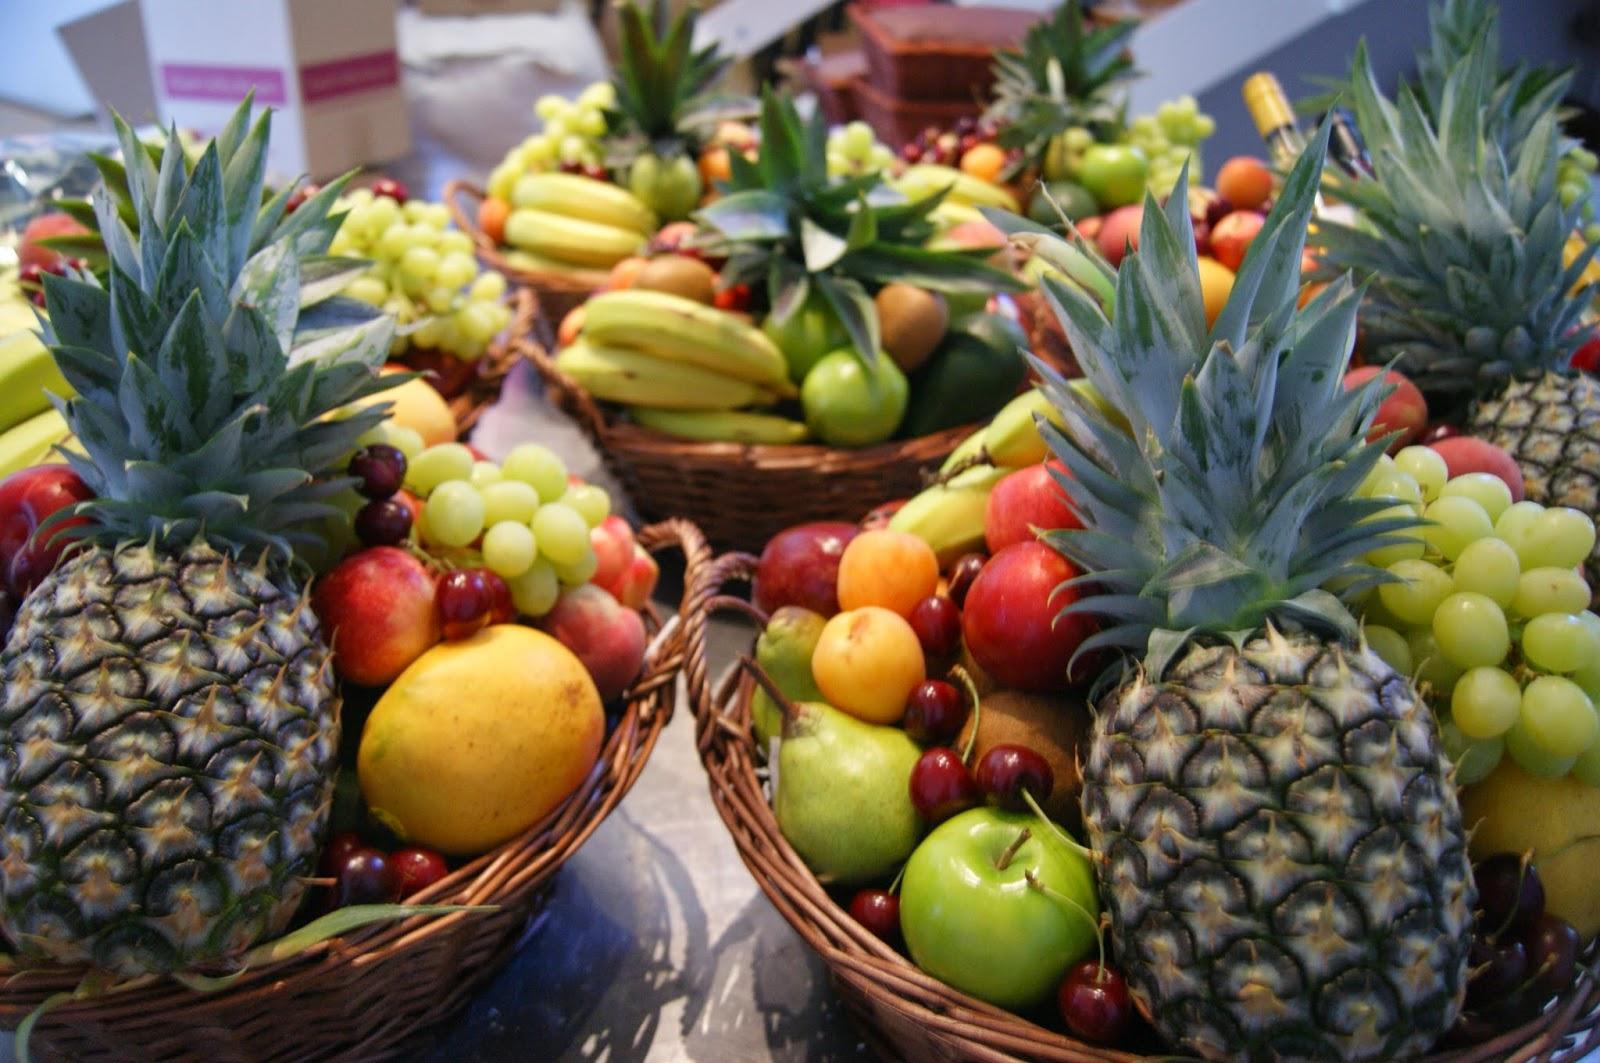 Fruit Basket Lake Macquarie Call 1300 284 684 January 2014